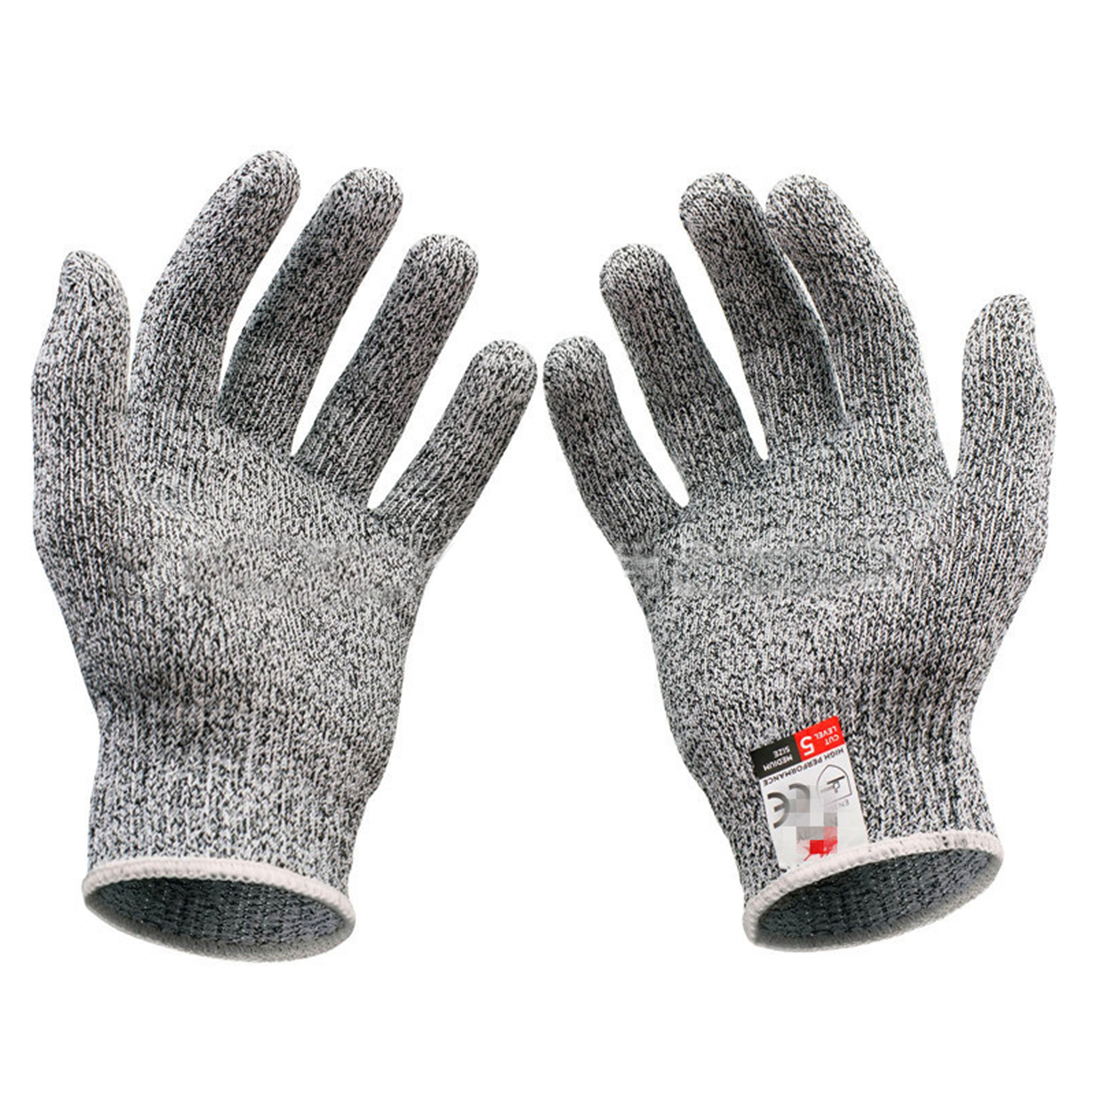 Cut Resistant Anti Knife Glove Chain Saw Safty Gloves